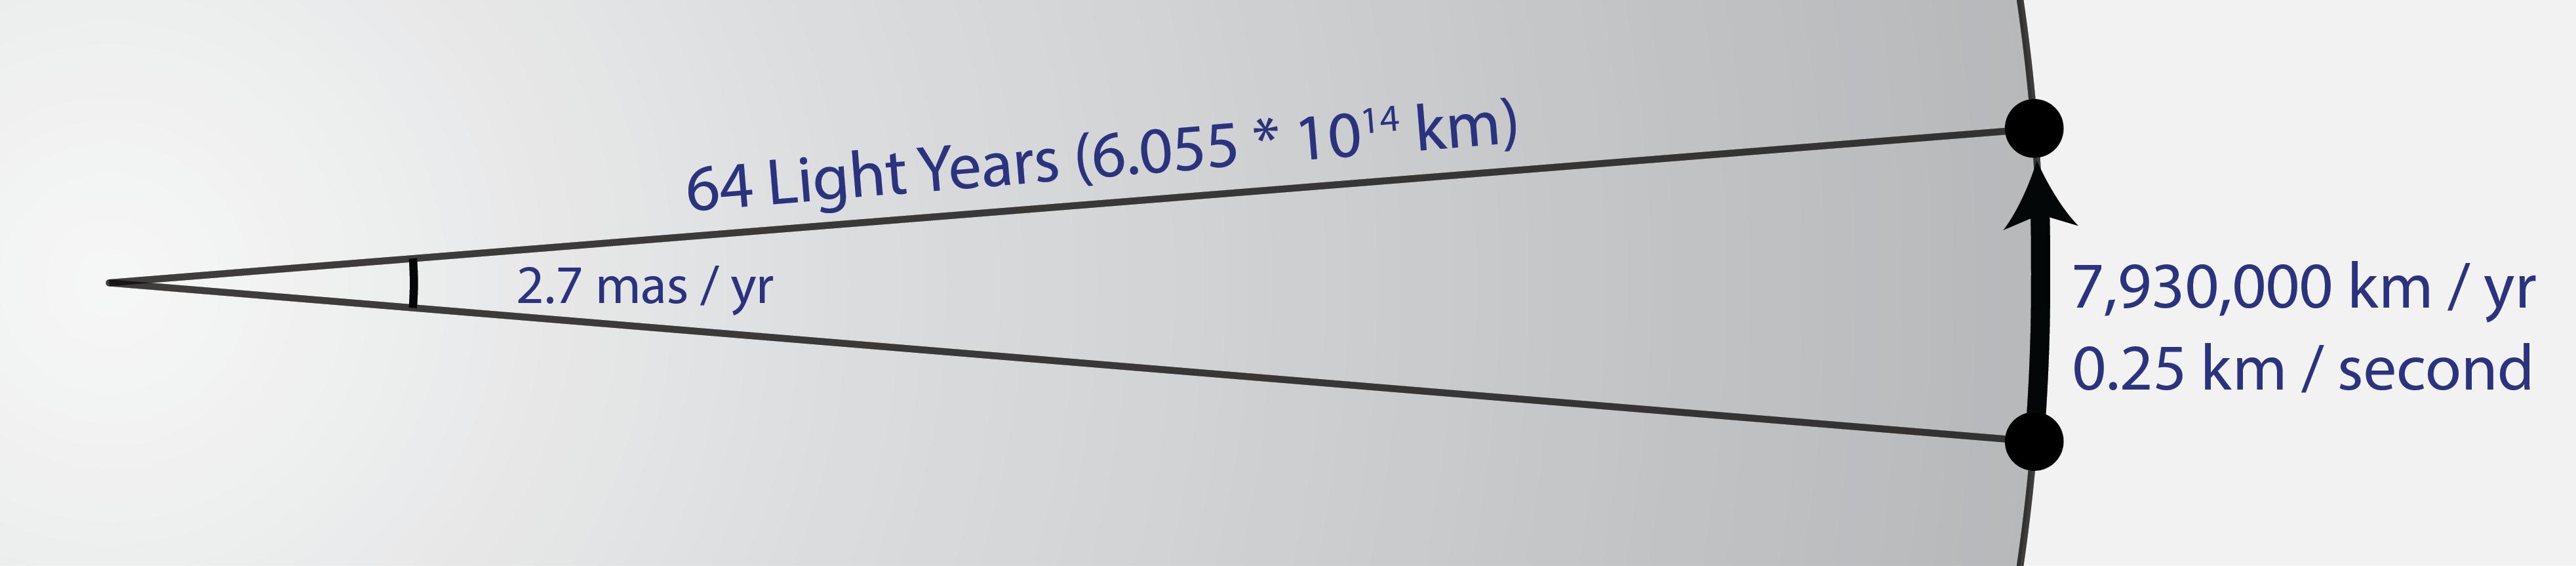 14-Gliese_710-transverse_velocity-01.png